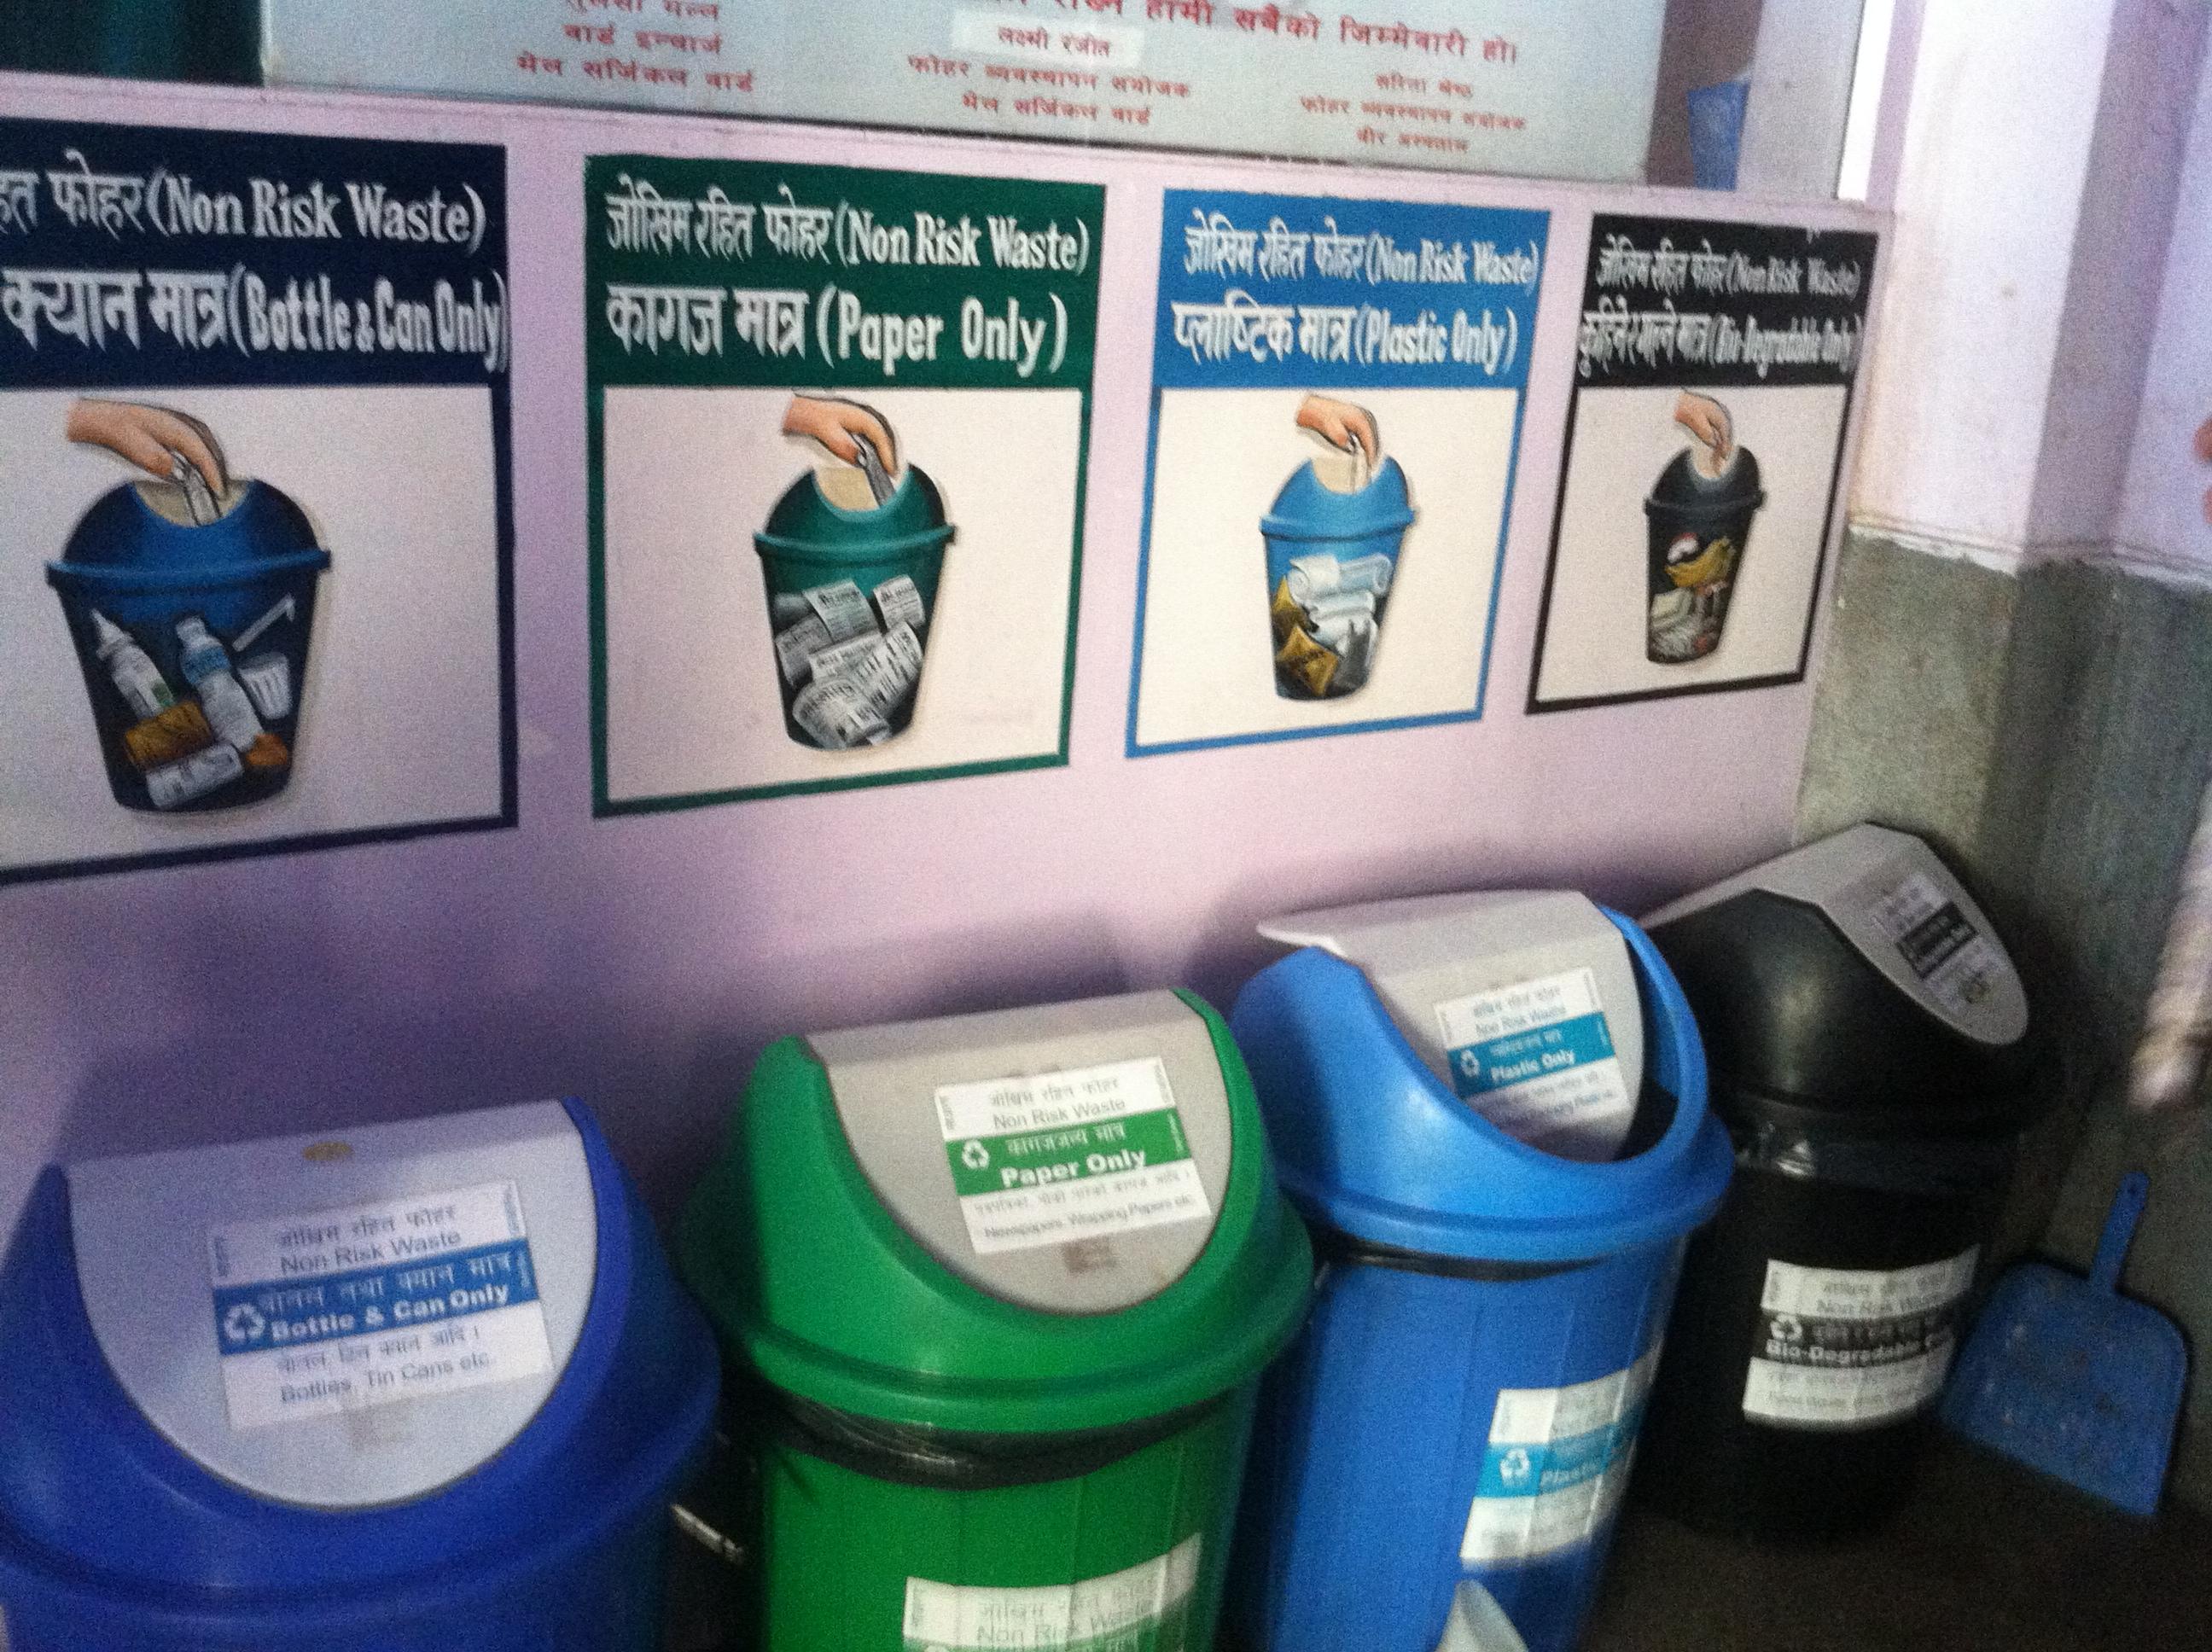 The New Humanitarian Eco Friendly Medical Waste Disposal